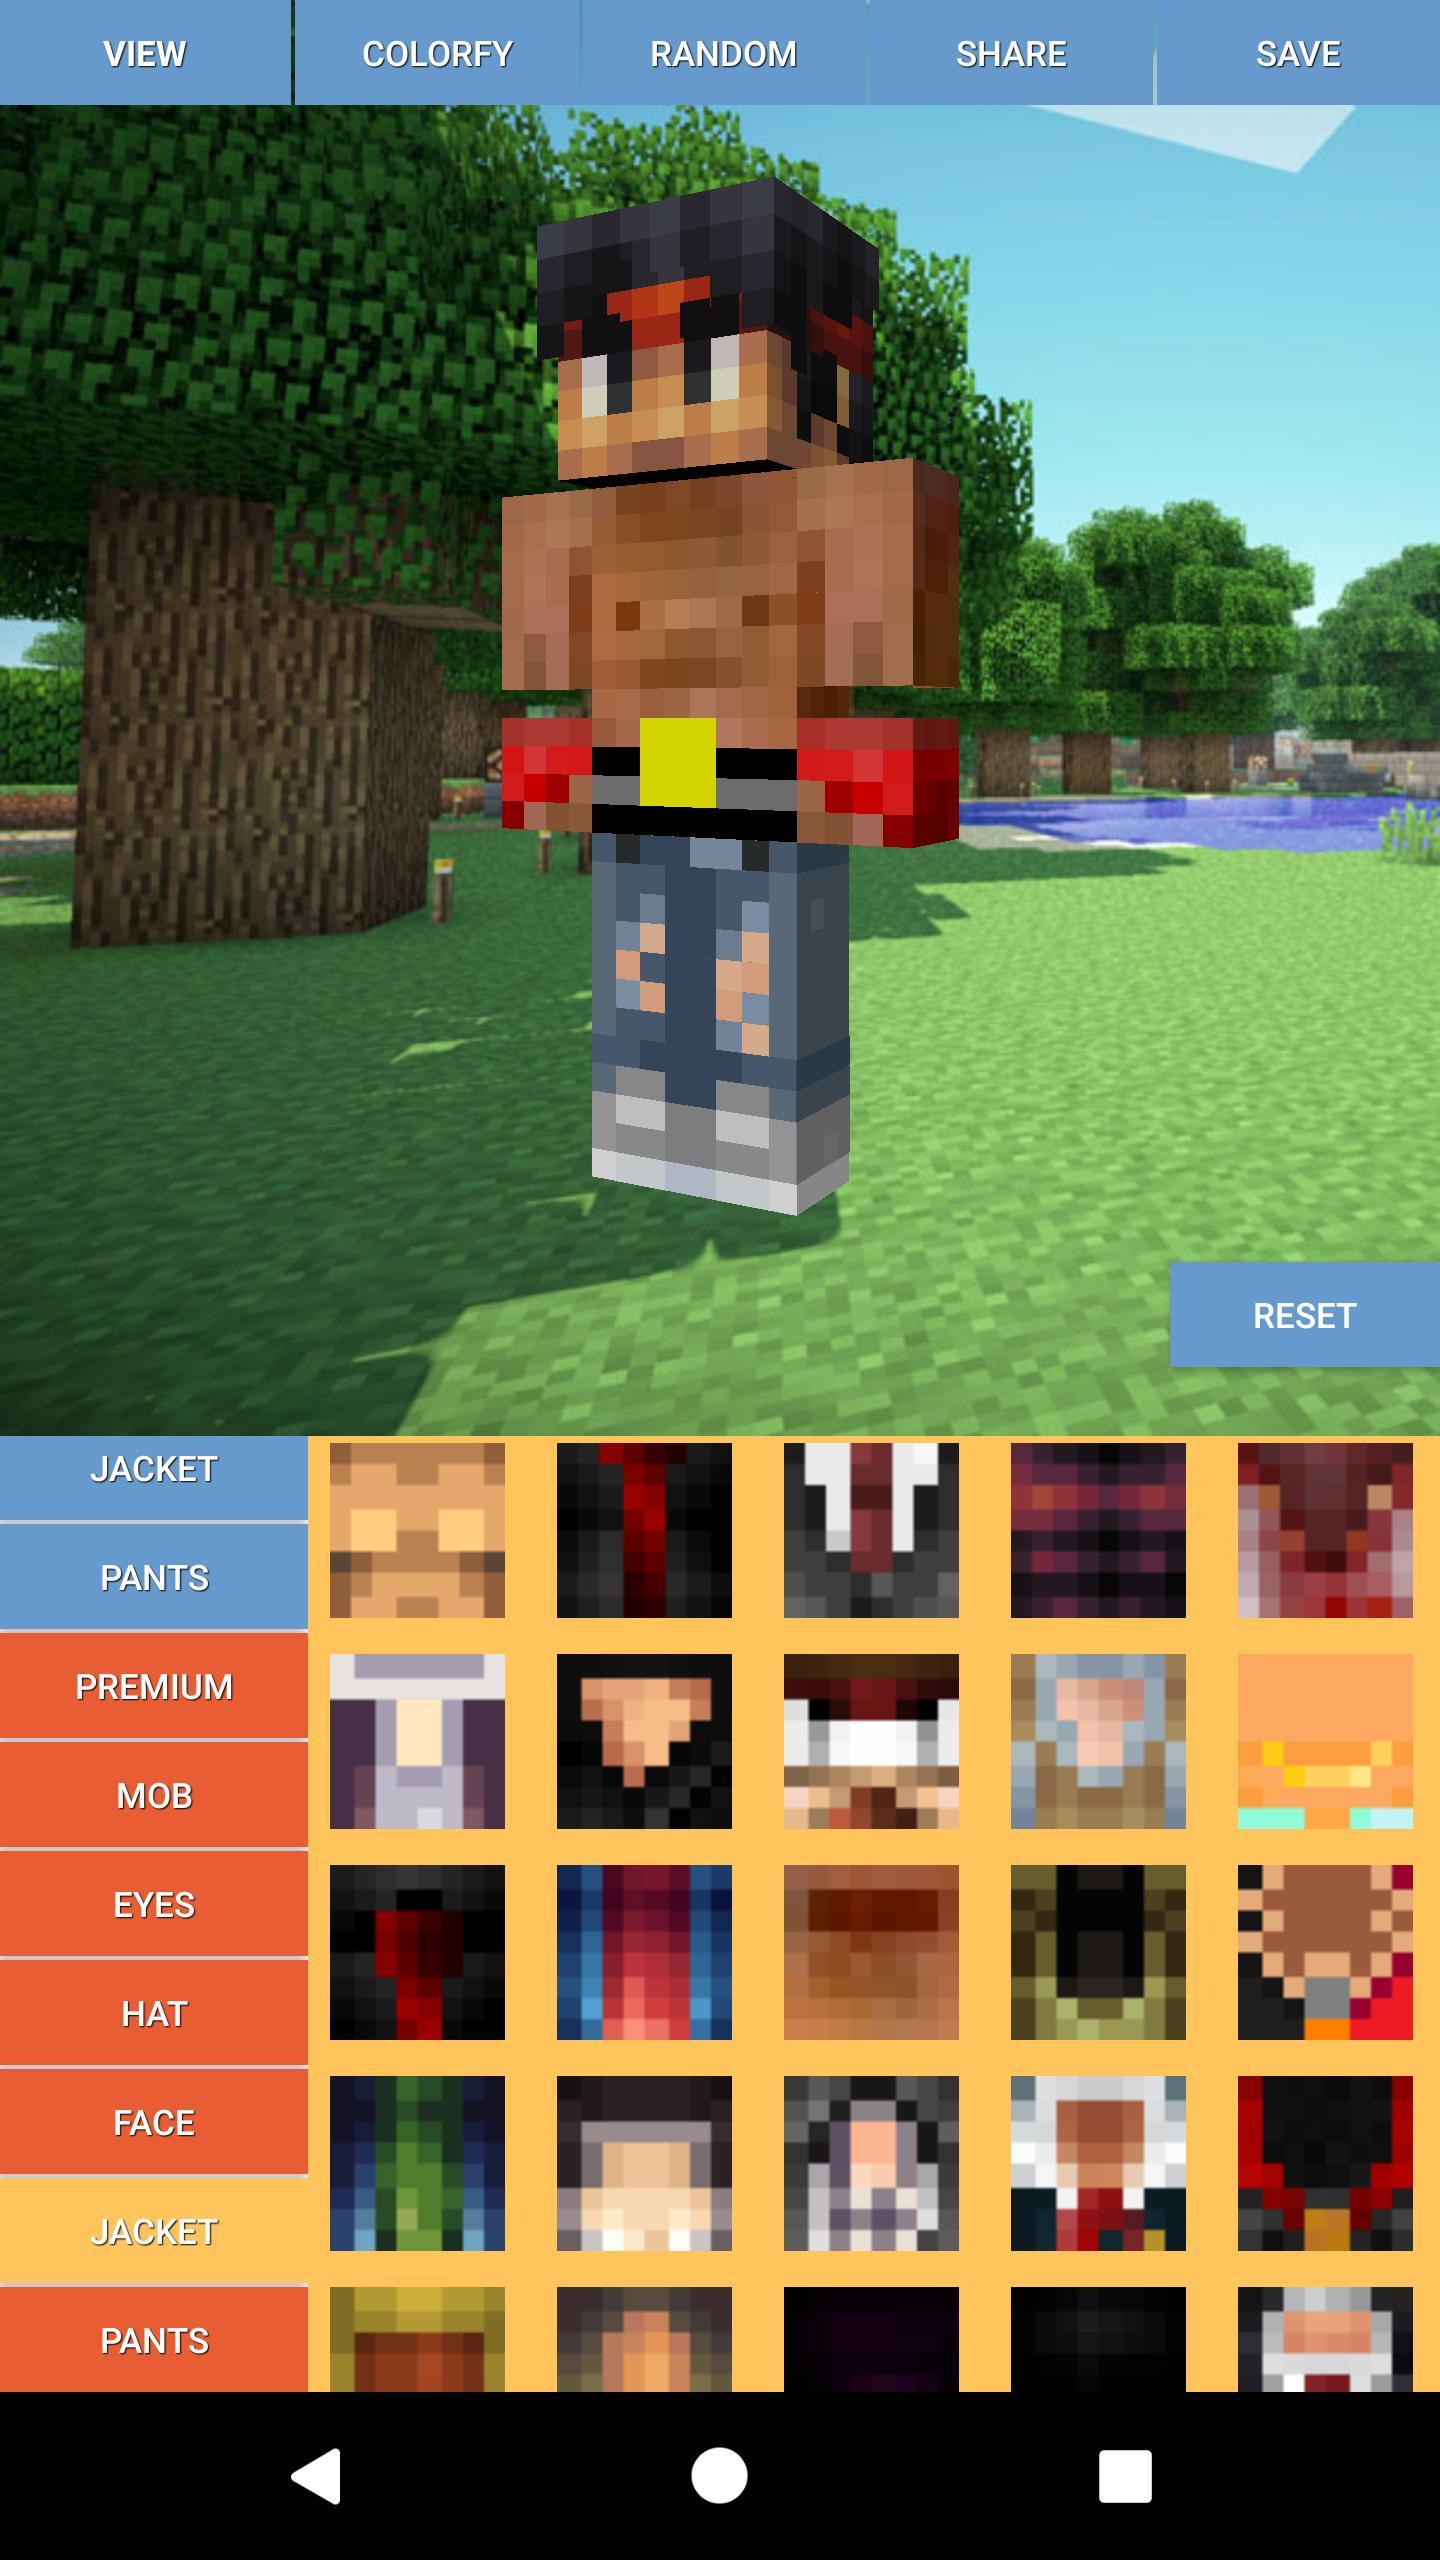 Custom Skin Editor Minecraft para Android - APK Baixar